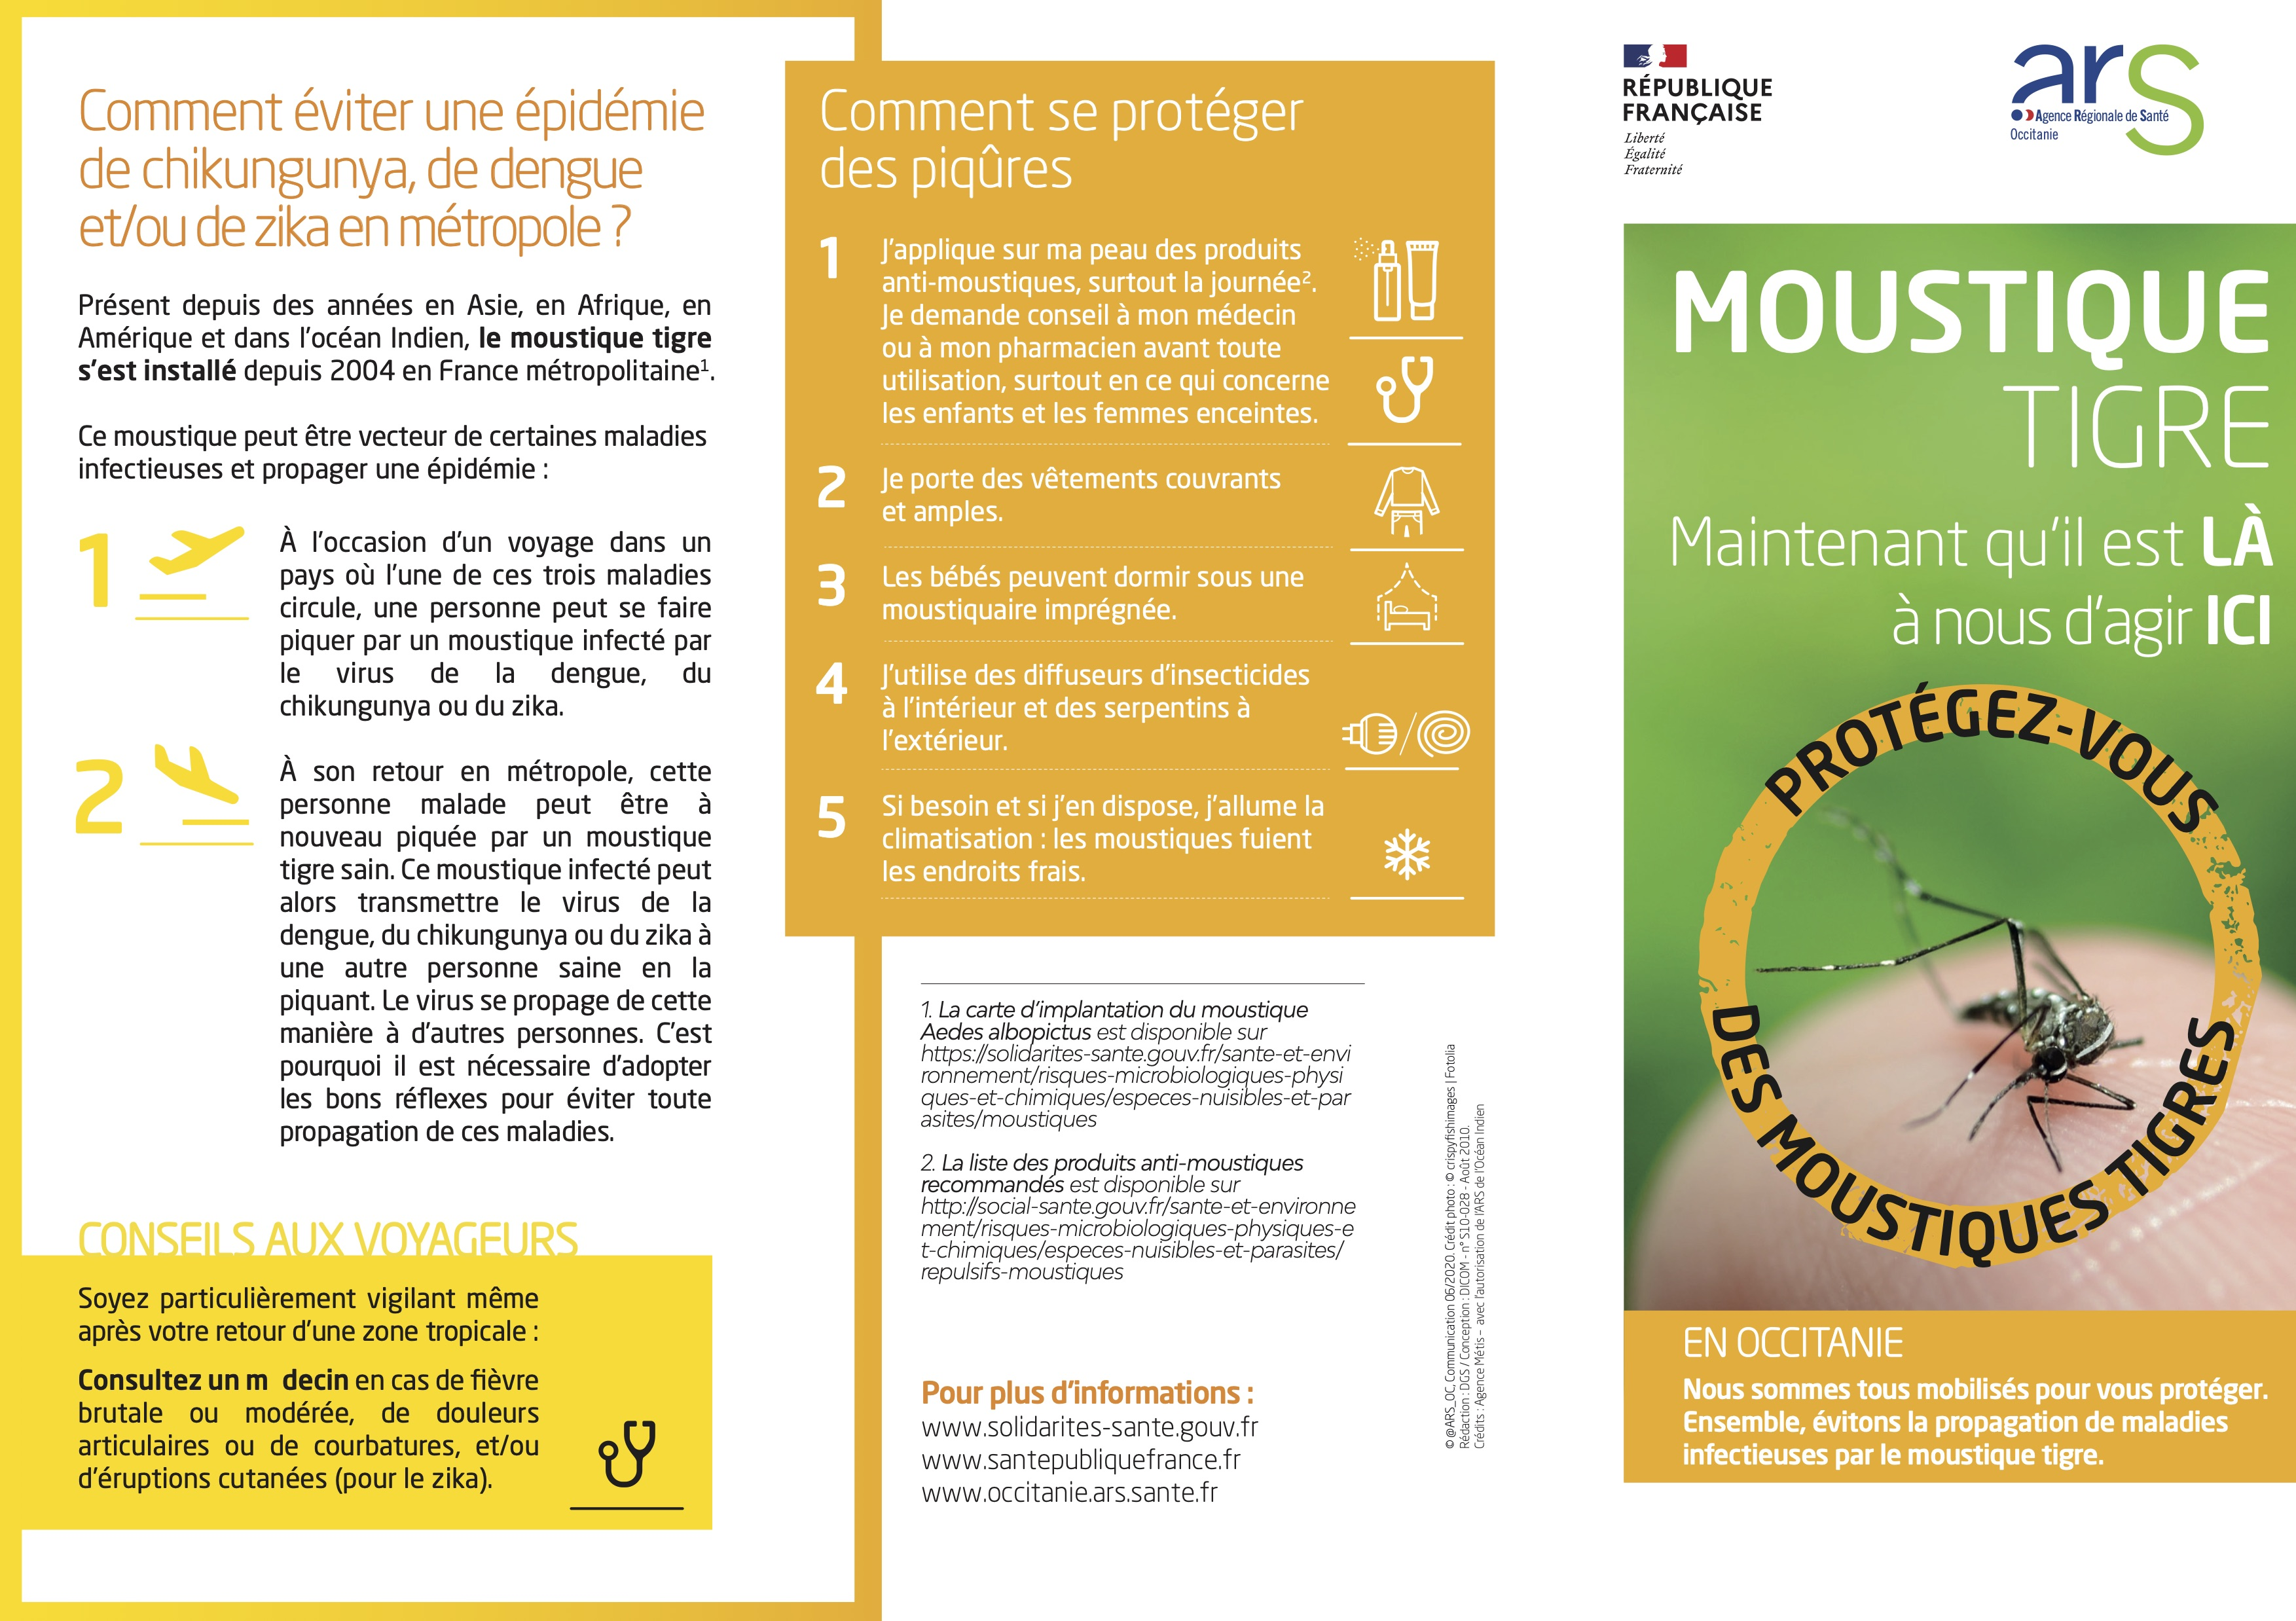 MoustiqueTigre_depliant_A4-1.jpg